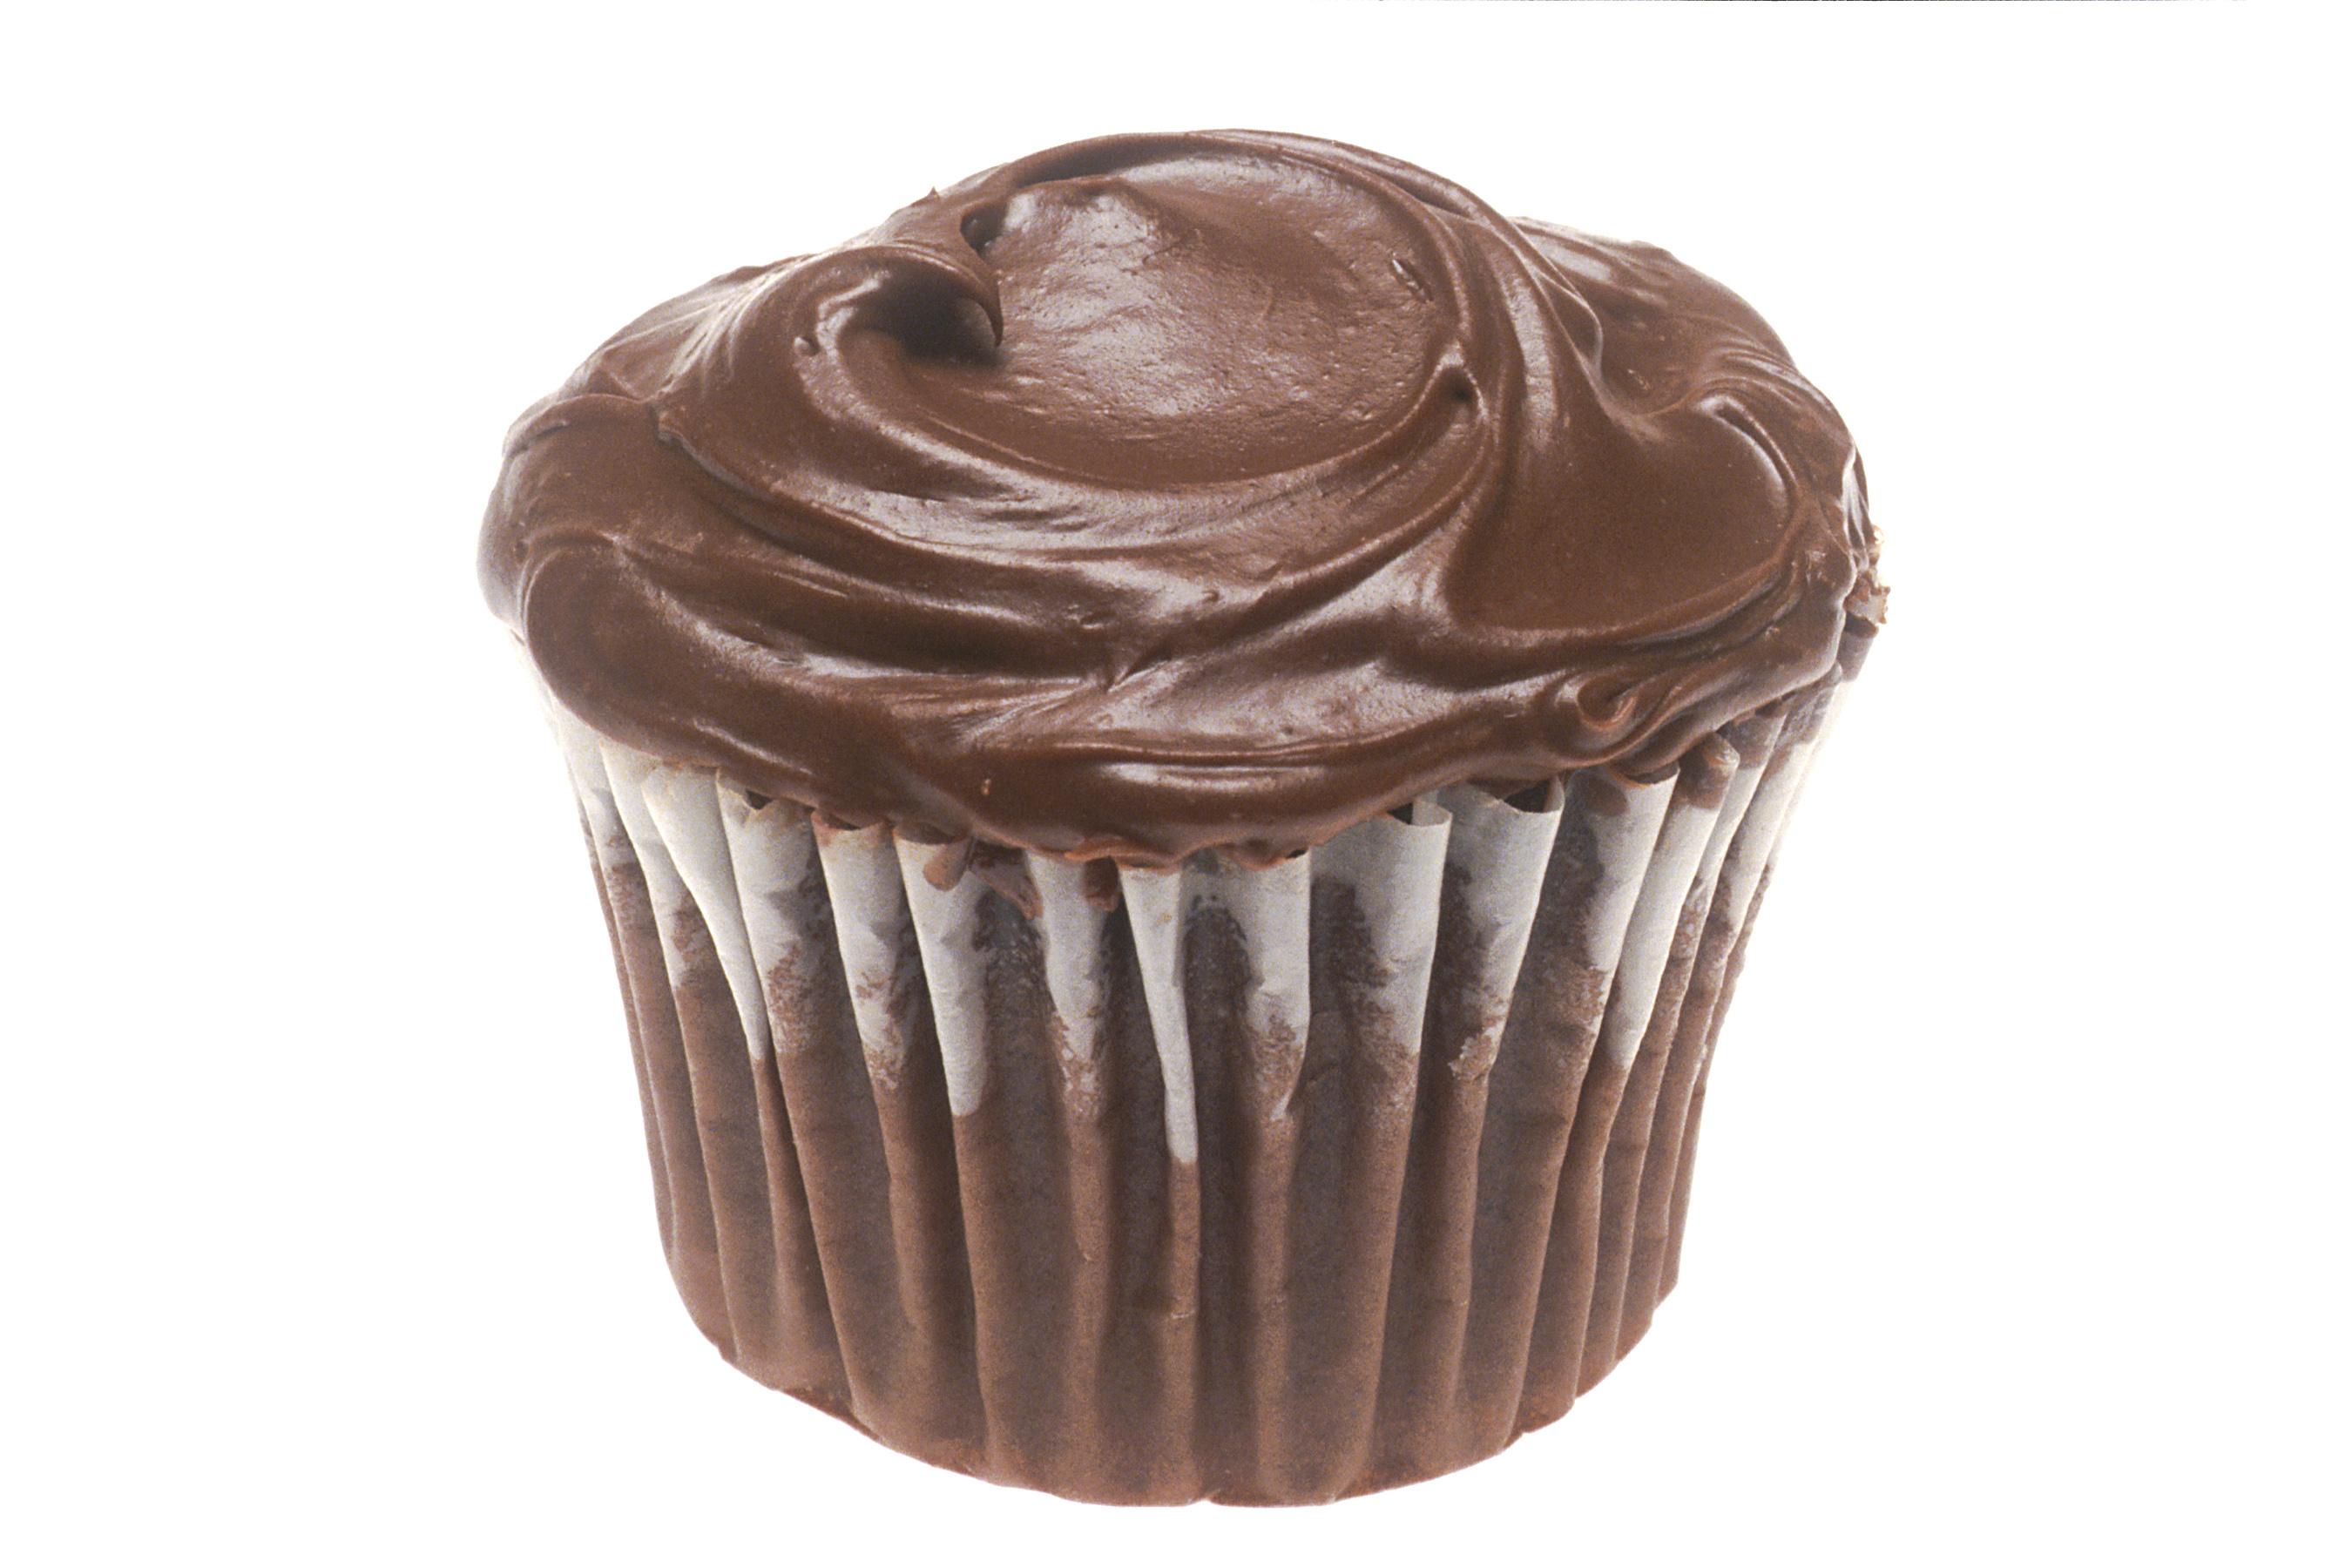 File:Cupcake (1).jpg